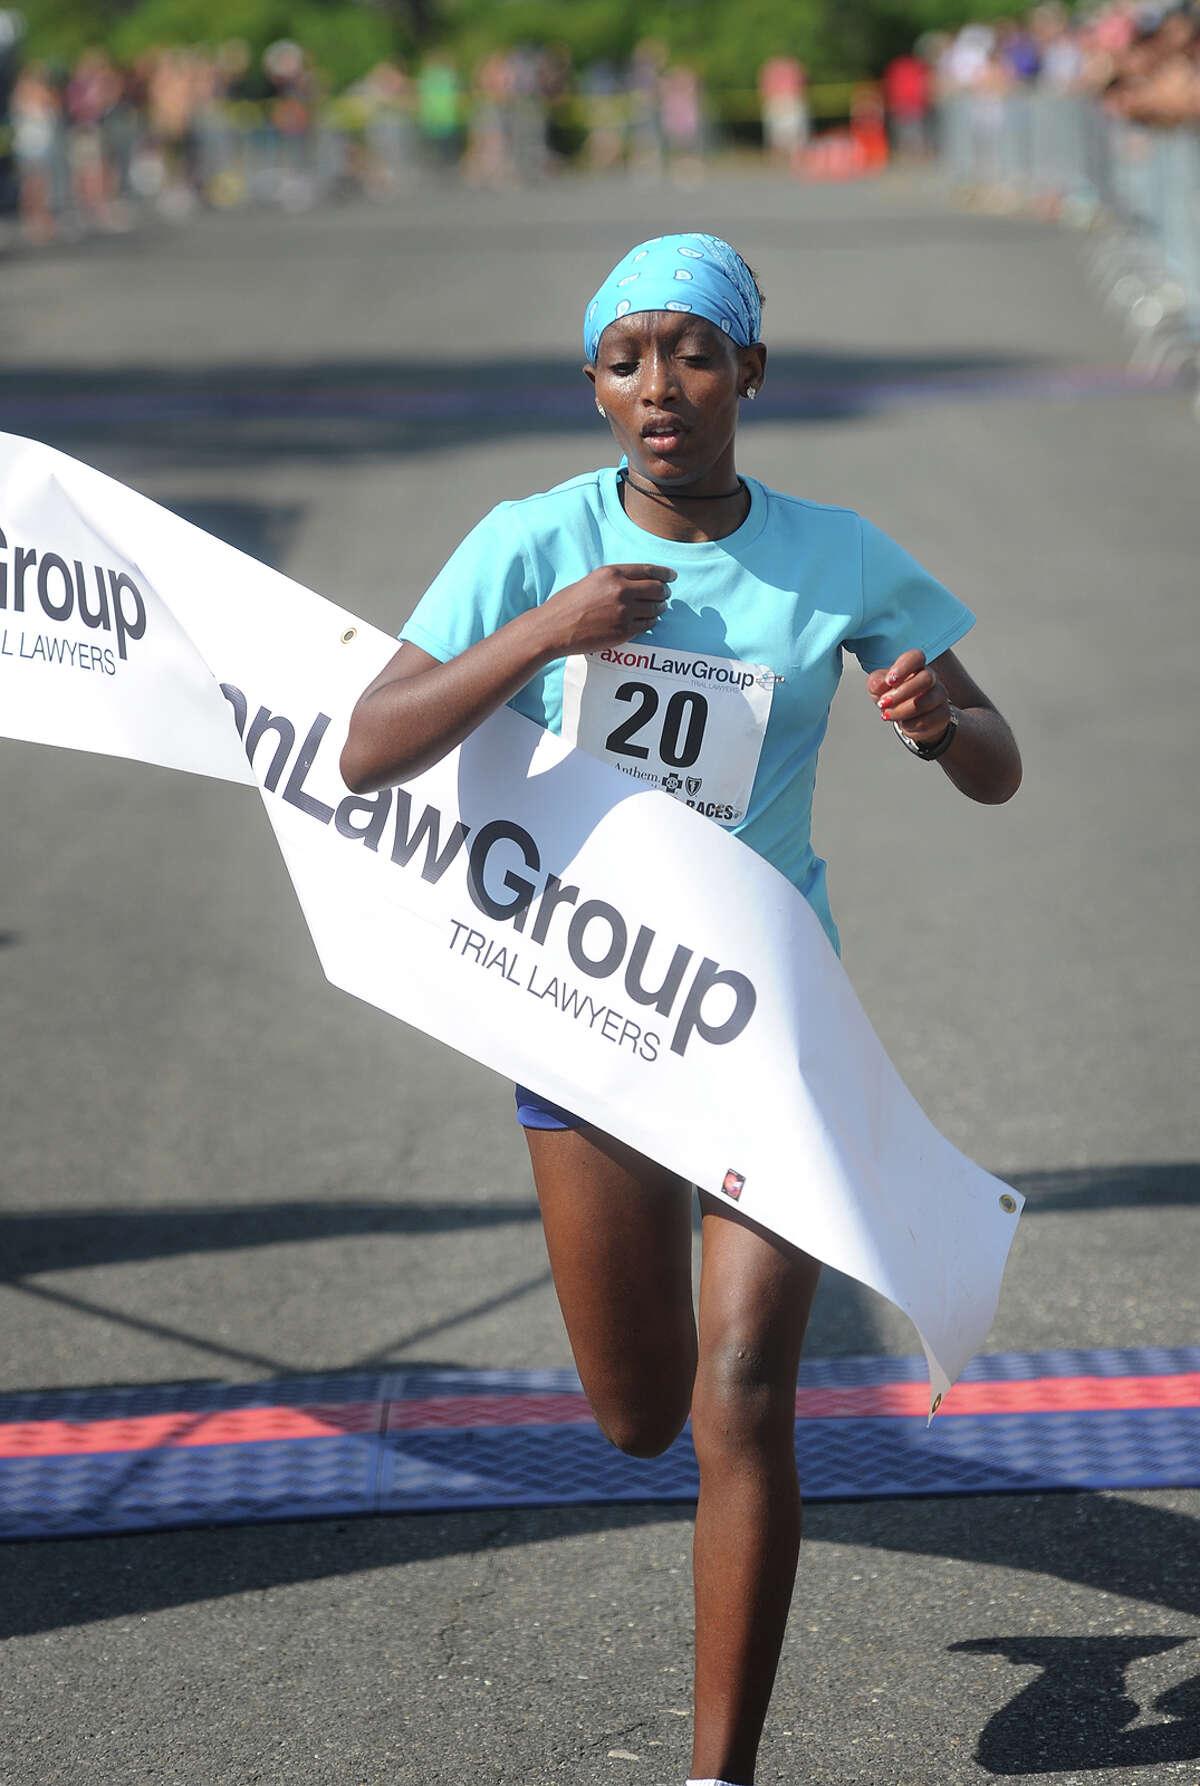 Ethiopian Sinke Biyadgilgn Dessie breaks the tape as the women's winner of the 2016 Faxon Law Fairfield Half Marathon in Fairfield, Conn. on Sunday, June 26, 2016.